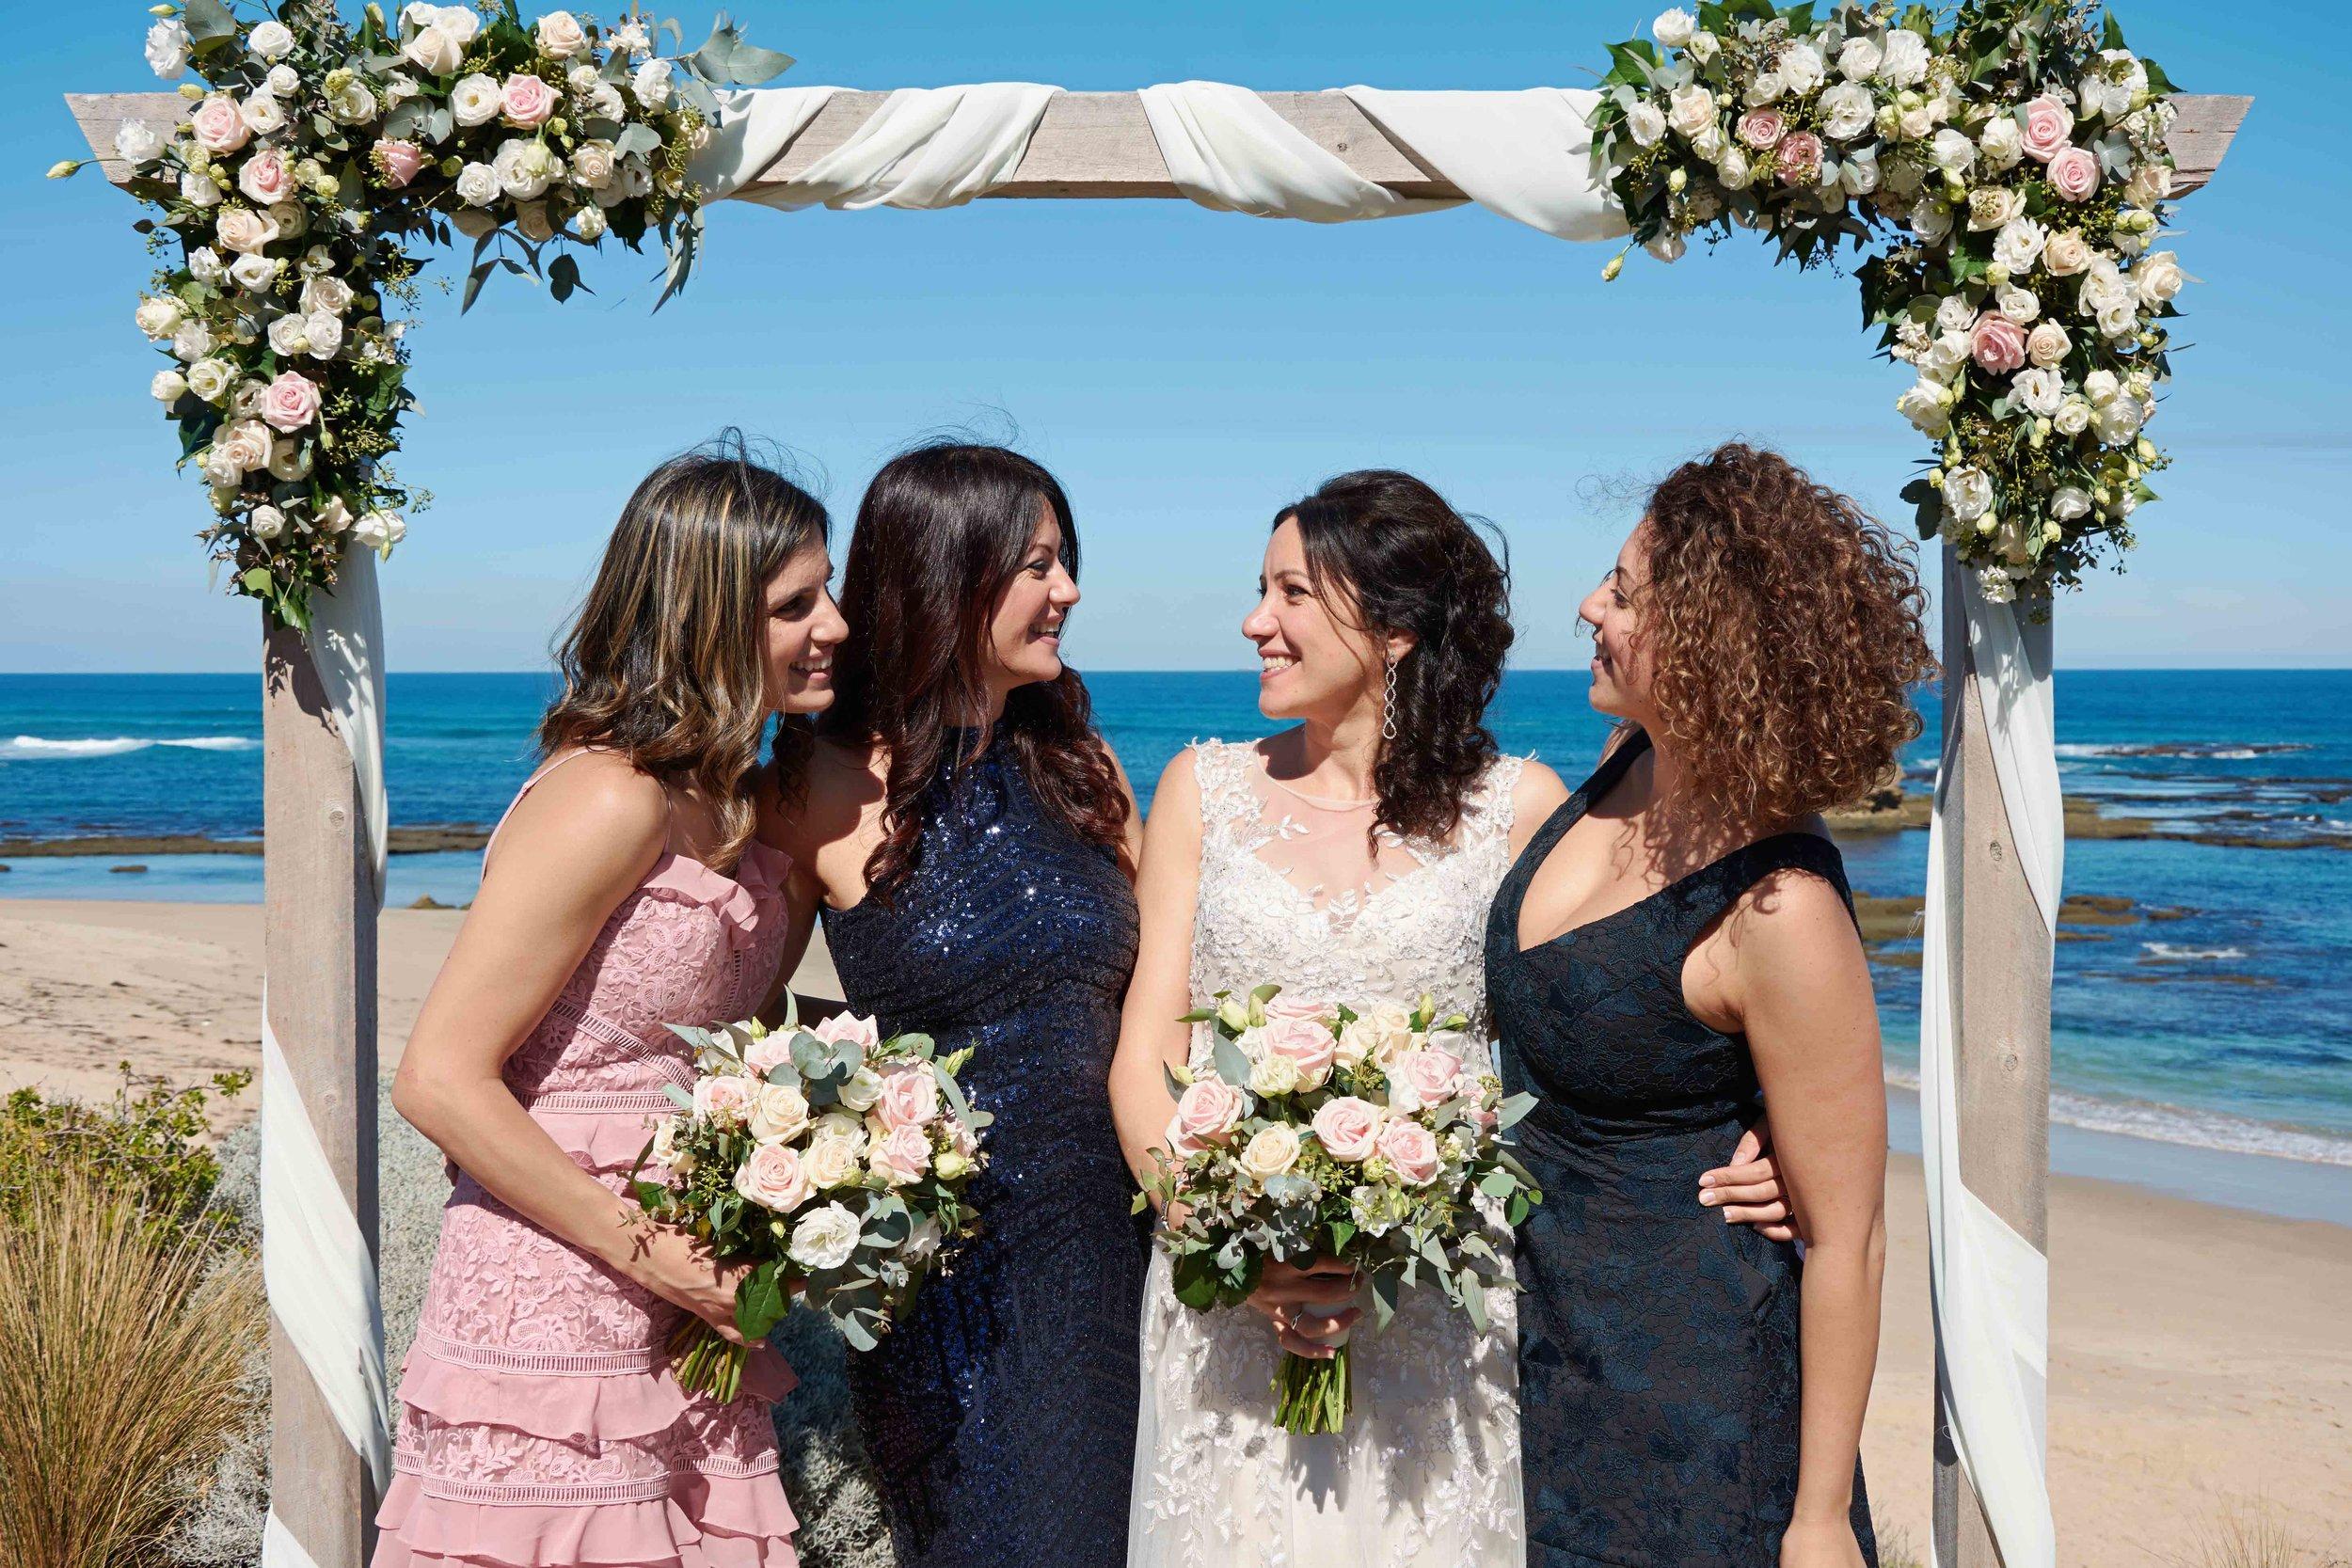 sorrento-wedding-photography-all-smiles-marissa-jade-photography-61.jpg